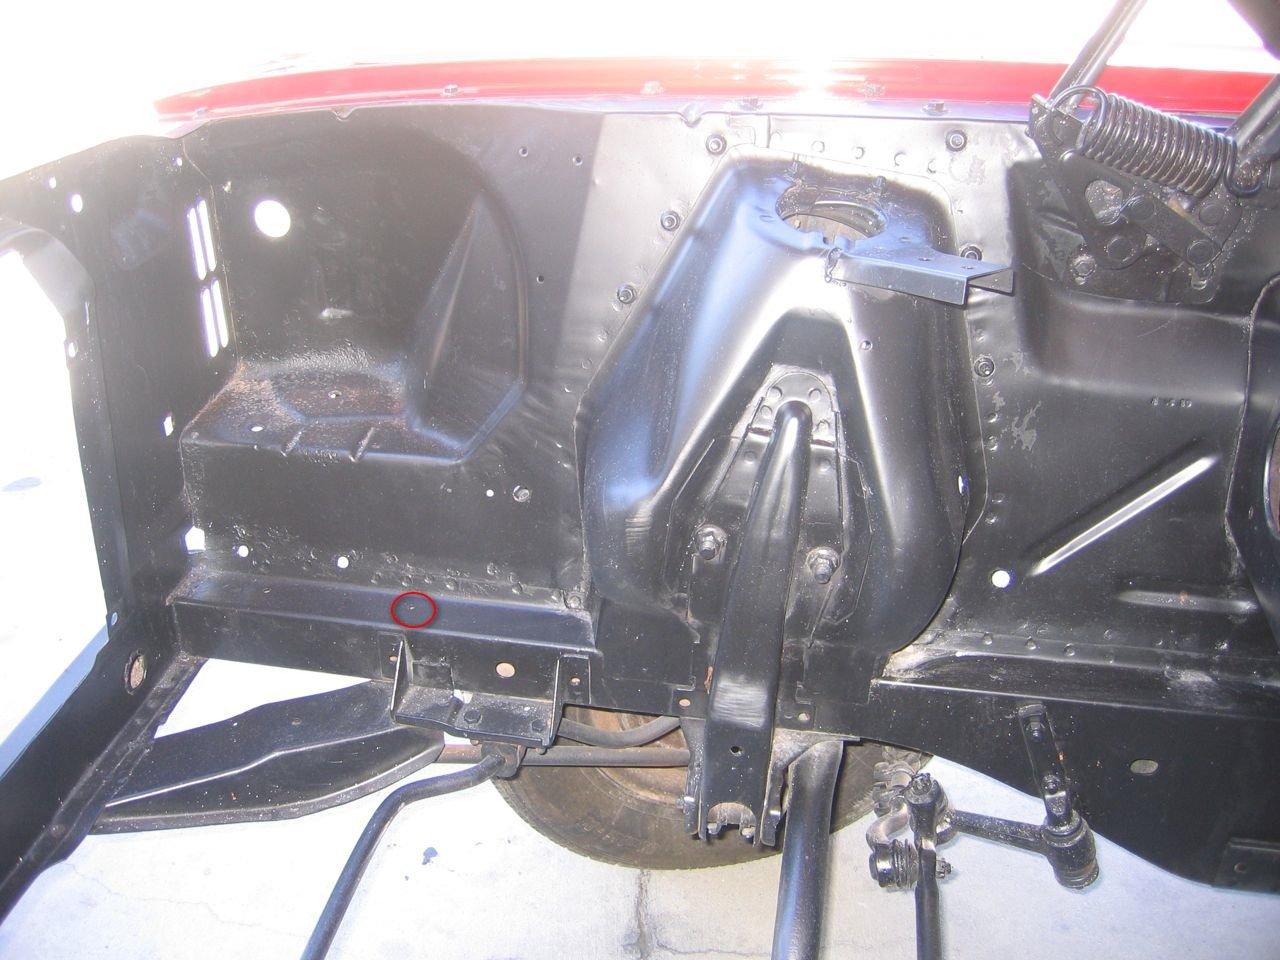 1968 Mustang Battery